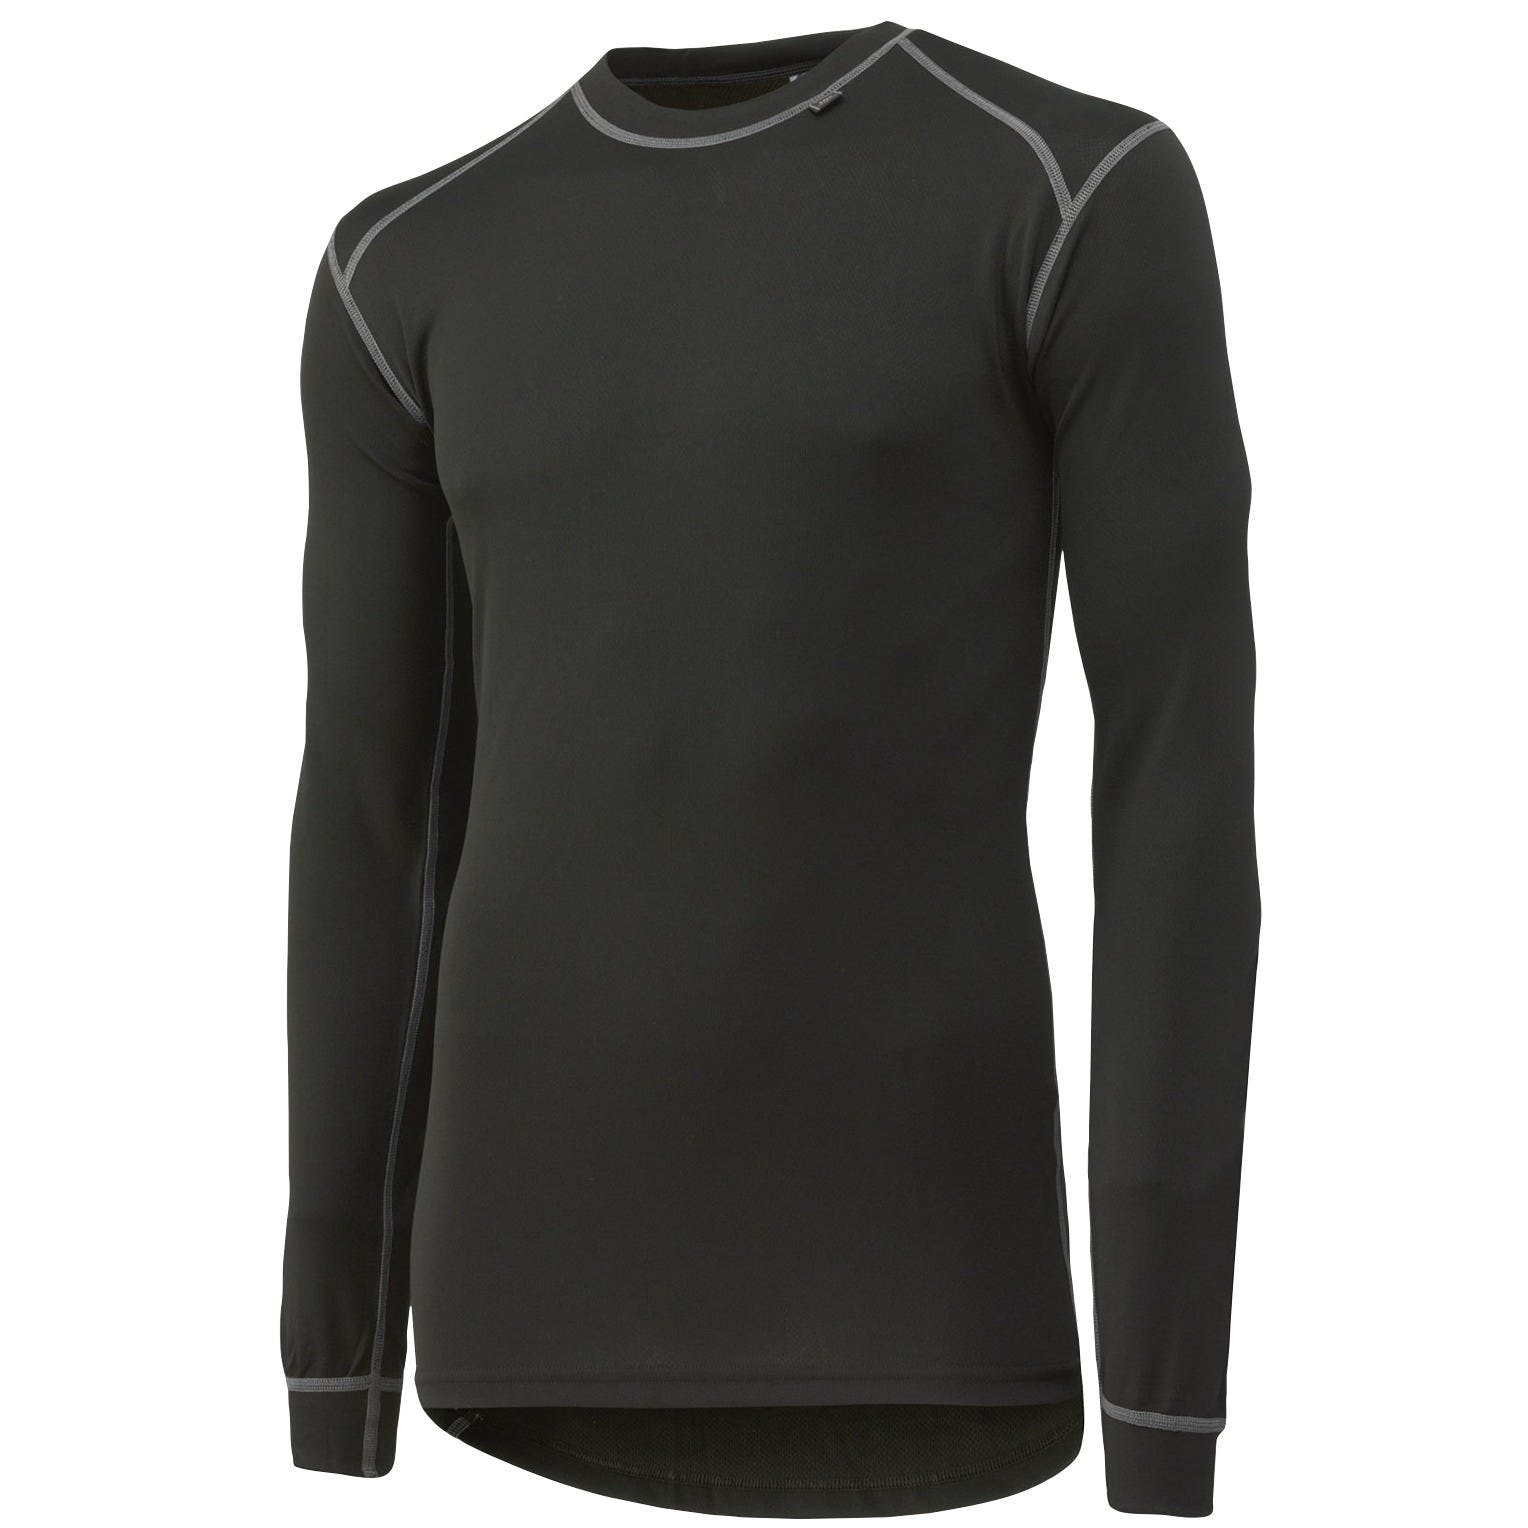 Helly Hansen Mens Magni Long Sleeve Warm Technical Baselayer T Shirt